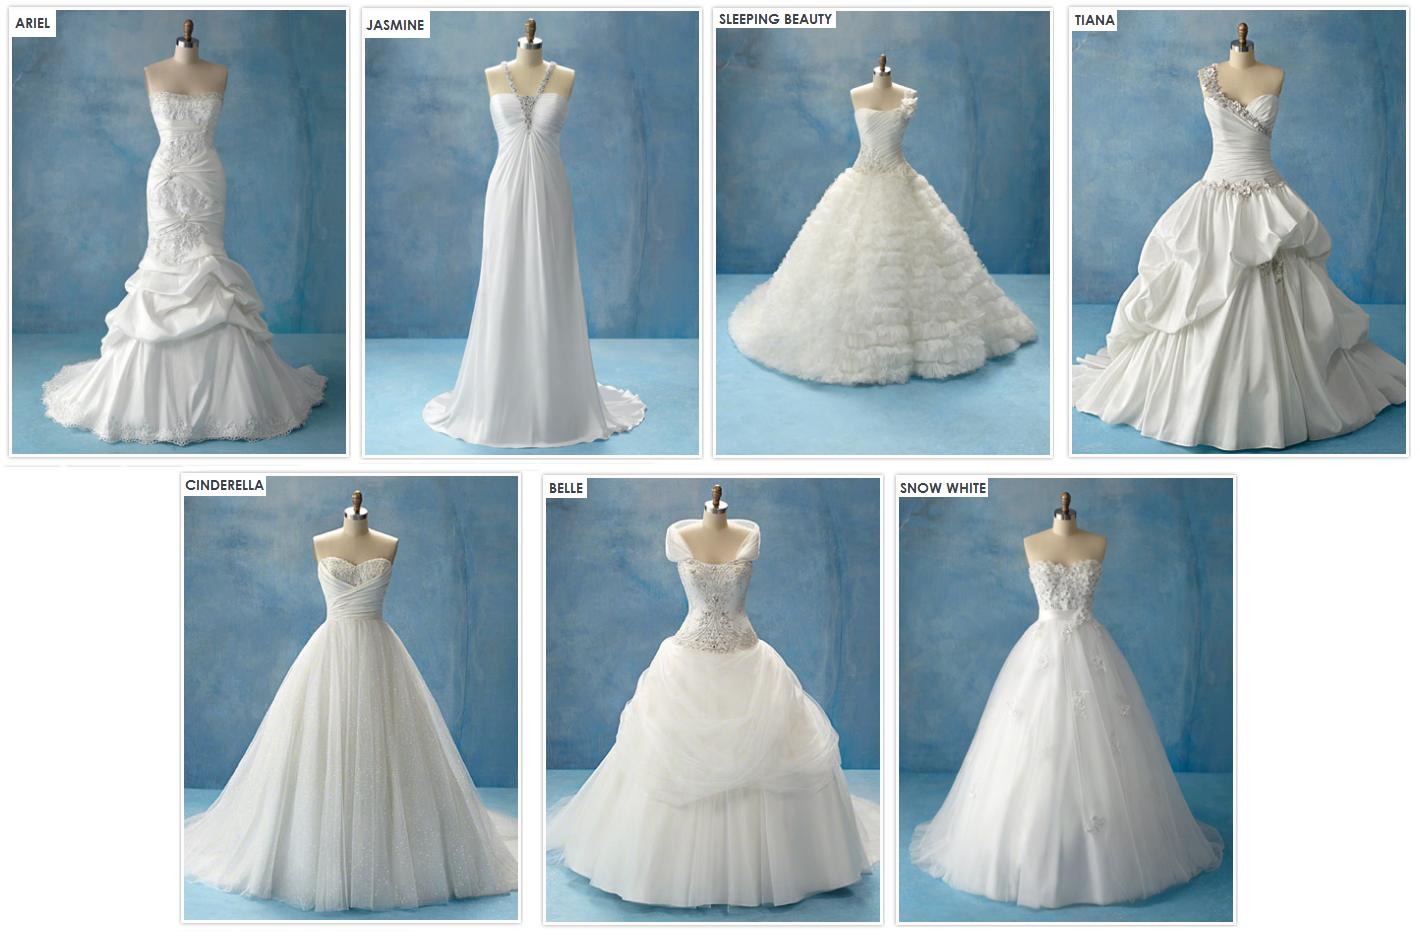 Fairy-tale Inspired Fashion | Disney fairies, Disney wedding dresses ...